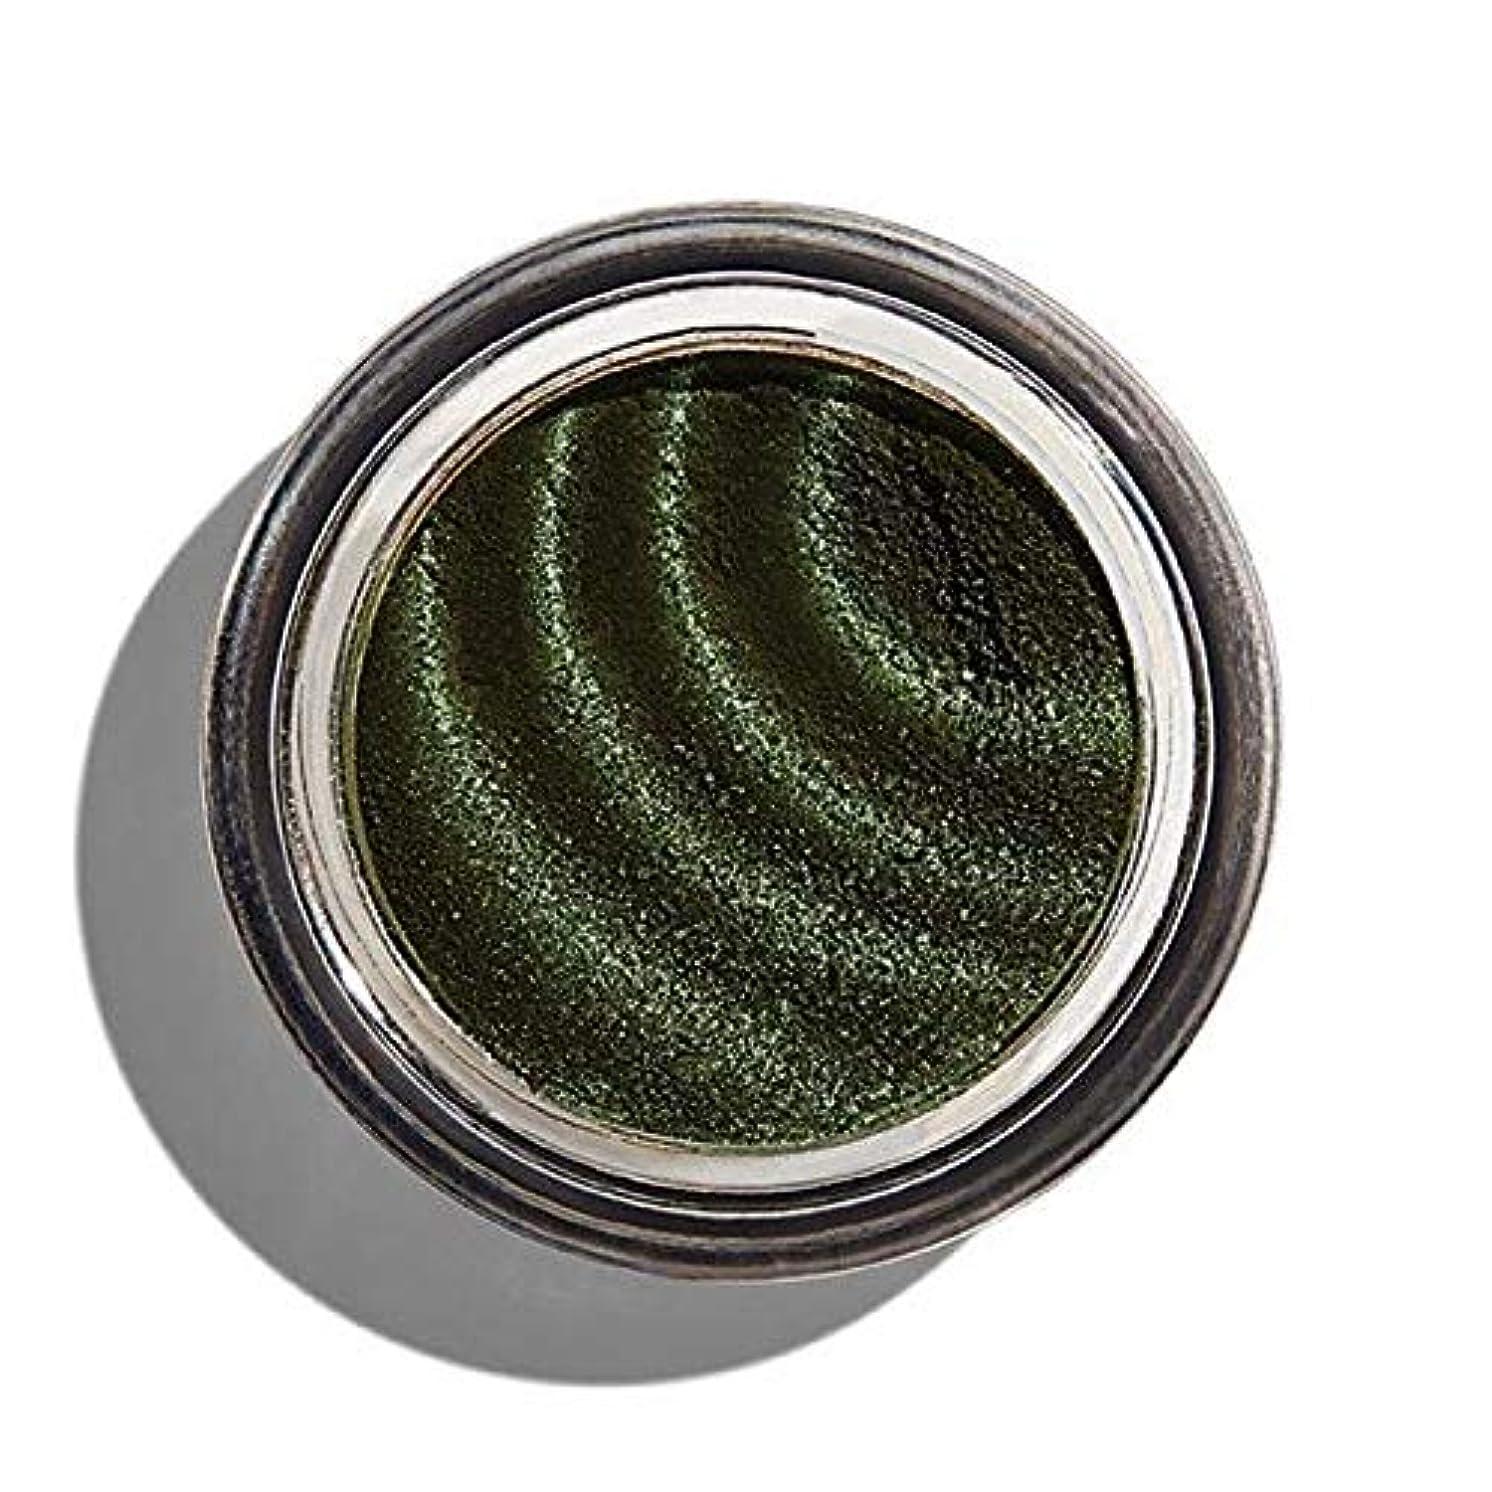 [Revolution ] 化粧回転磁化のアイシャドウグリーン - Makeup Revolution Magnetize Eyeshadow Green [並行輸入品]